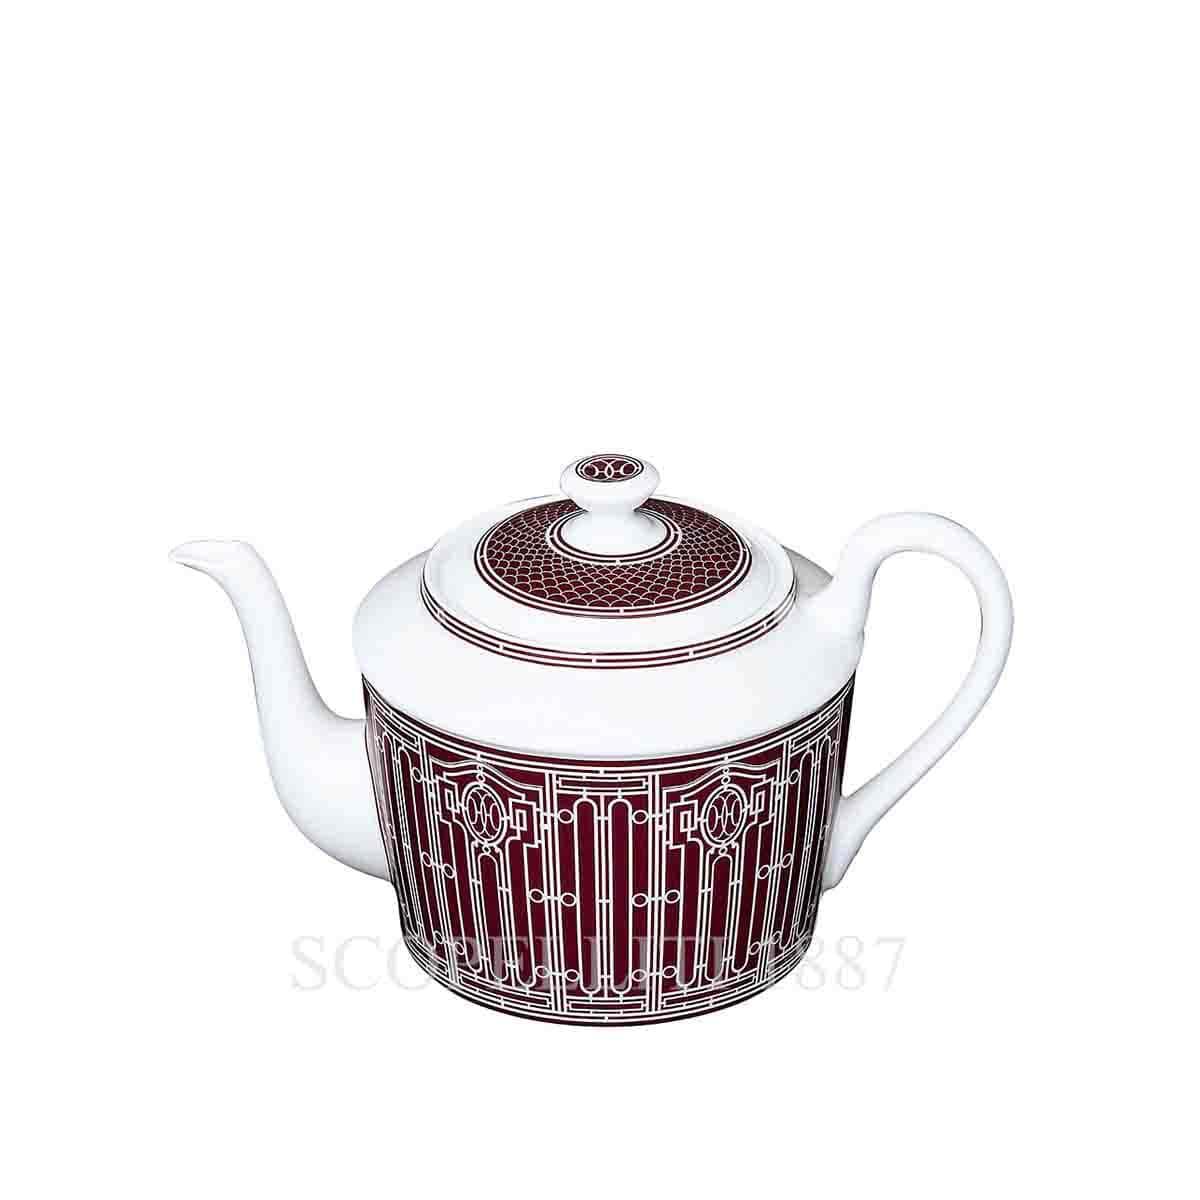 Hermes H Deco Red Teapot 6 Persons Scopelliti 1887